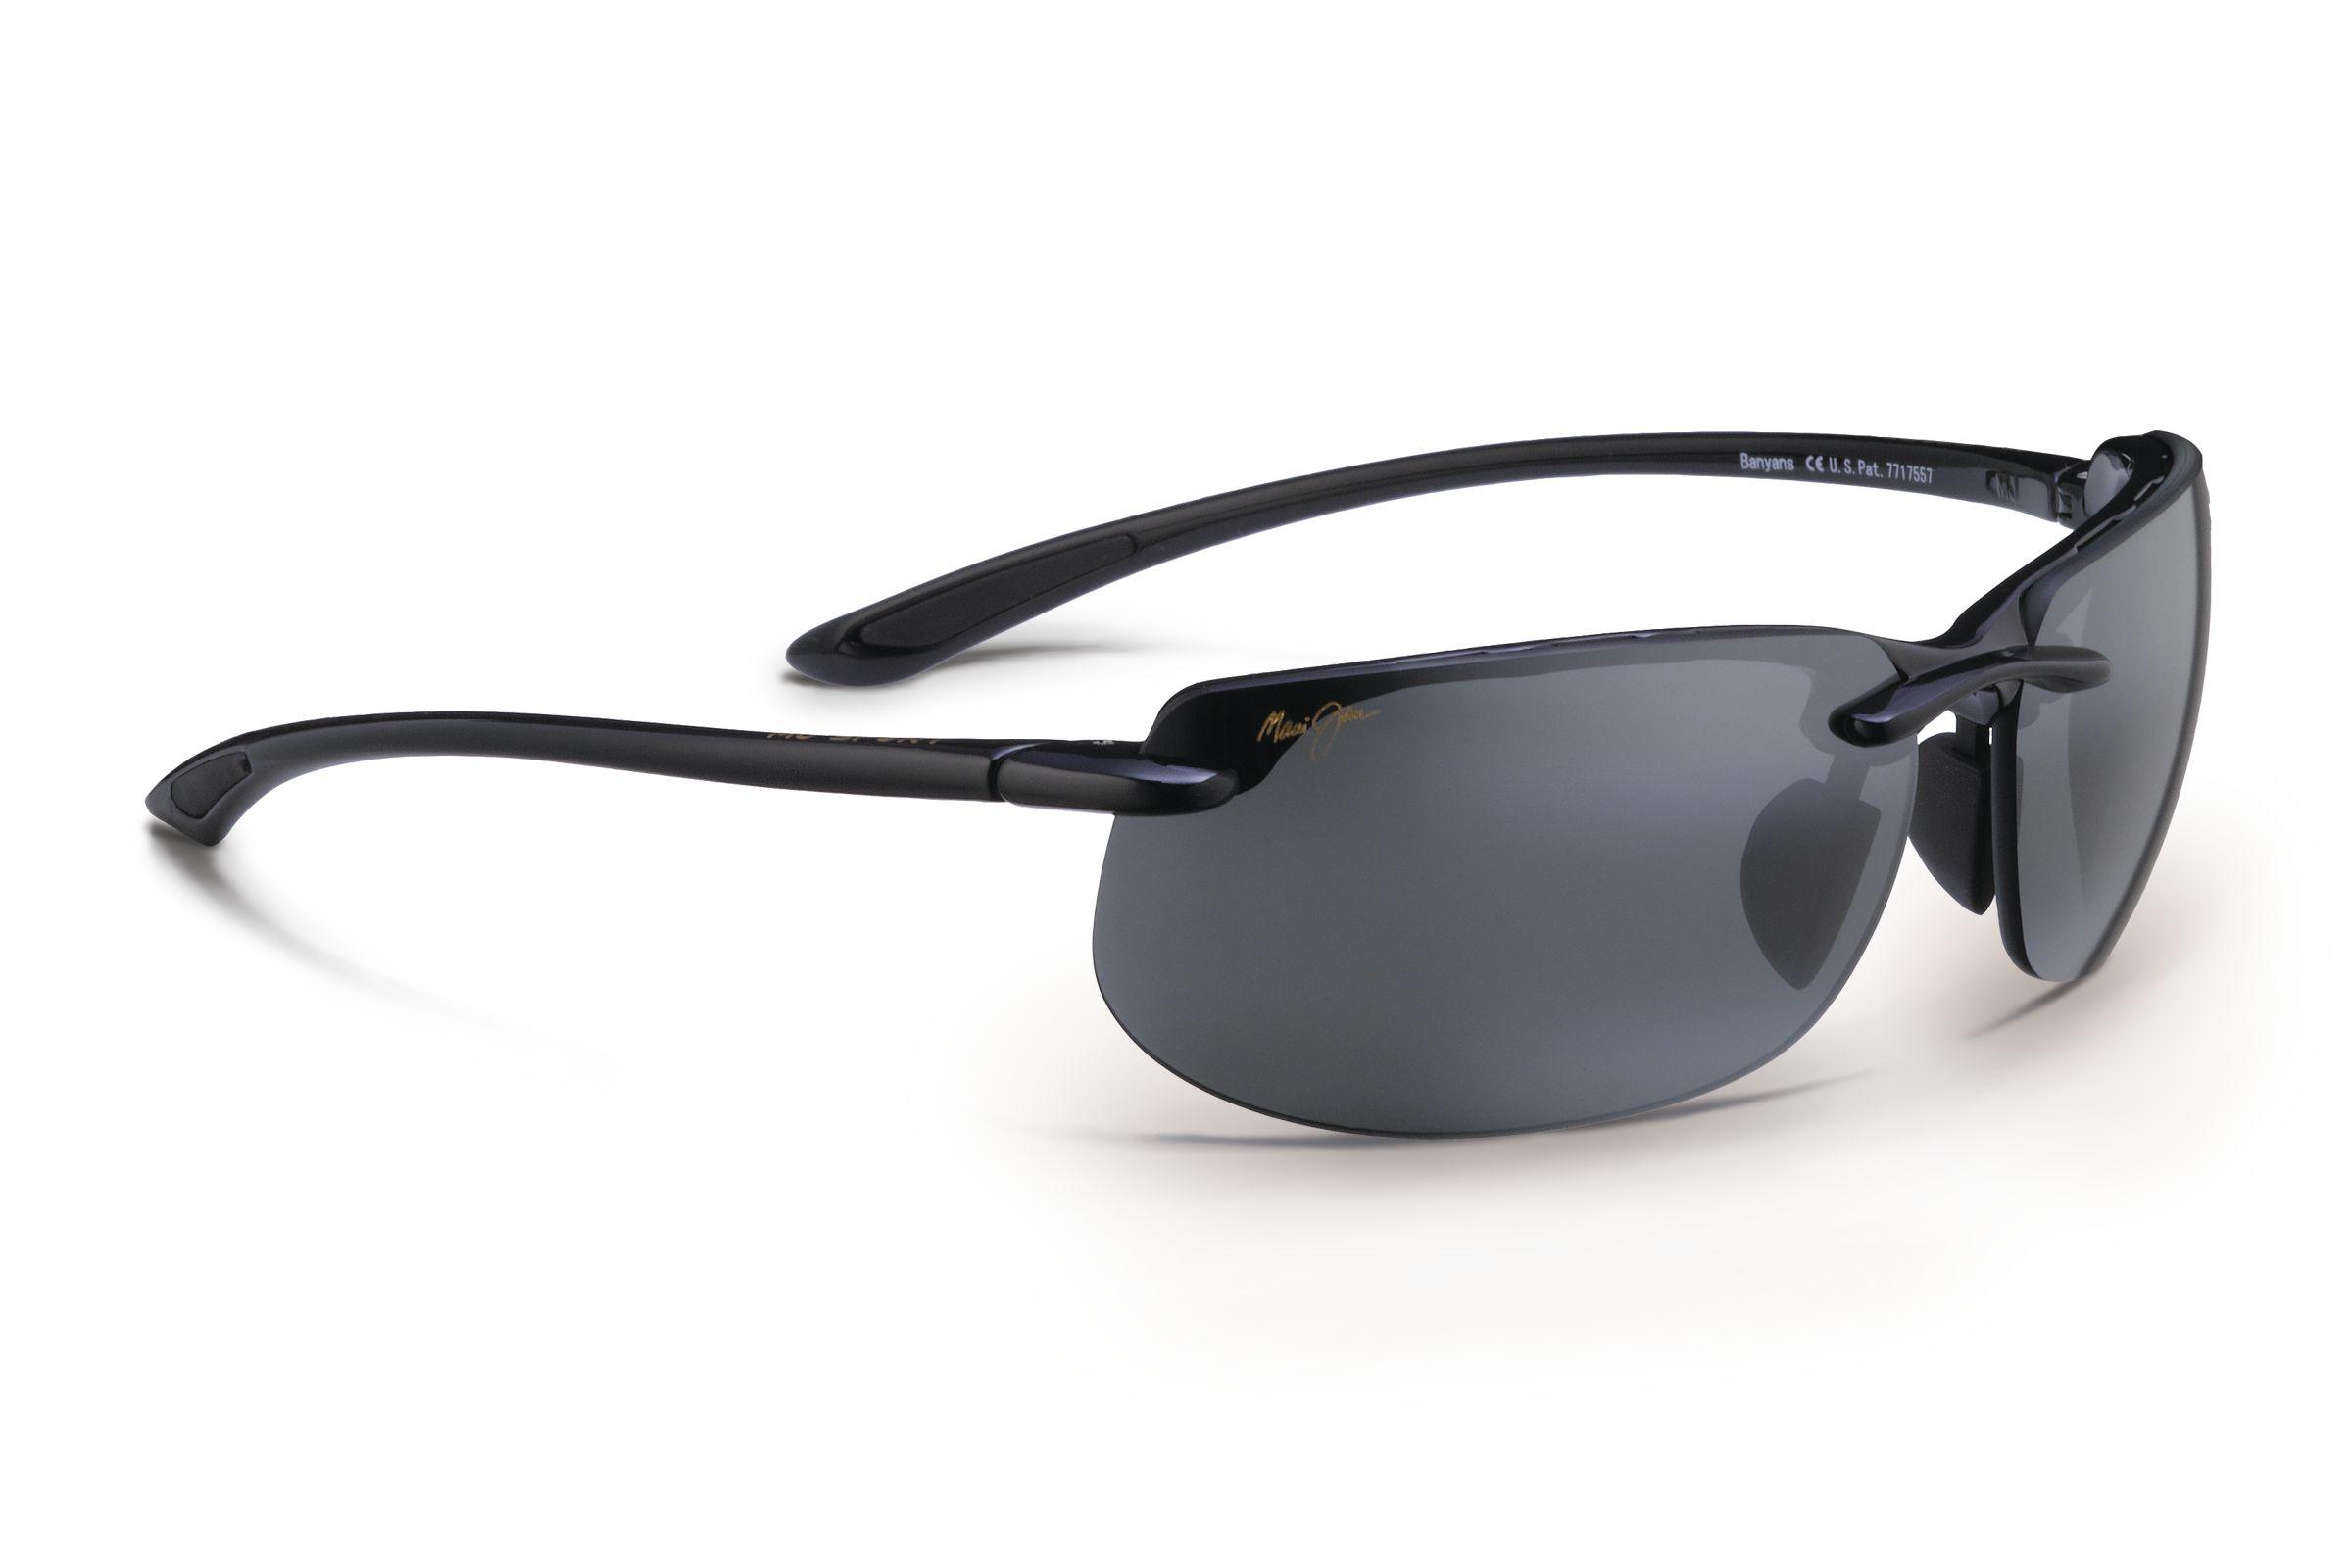 dc549249bf5 Maui Jim Banyans Sunglasses   Customer Rated w/ Free Shipping